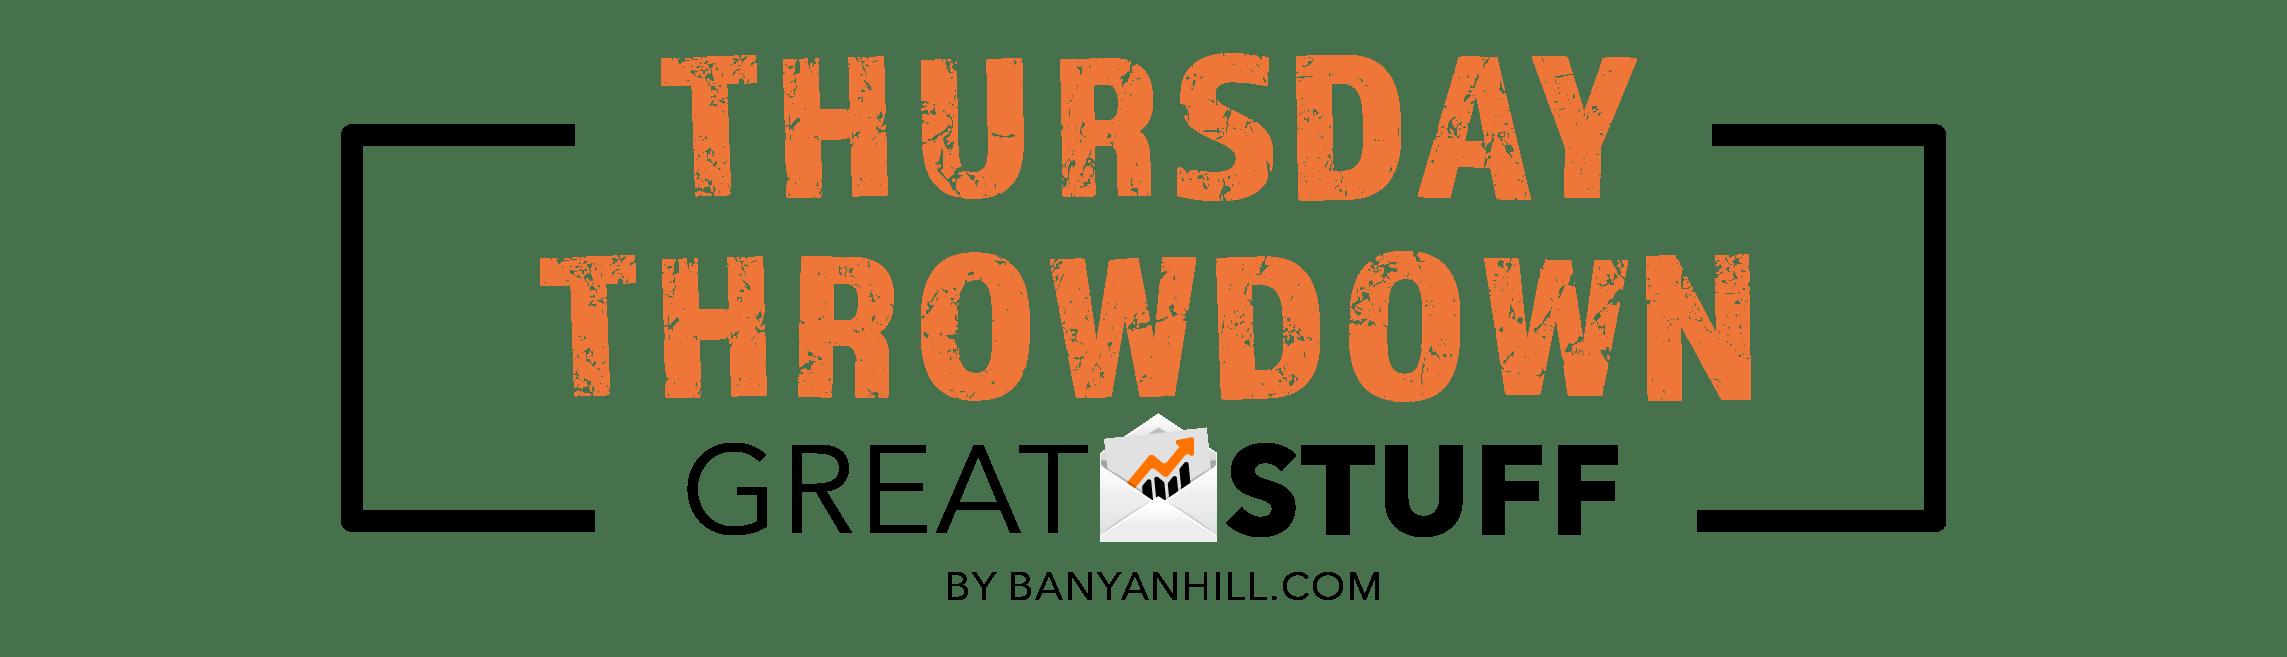 Great Stuff Thursday Throwdown header